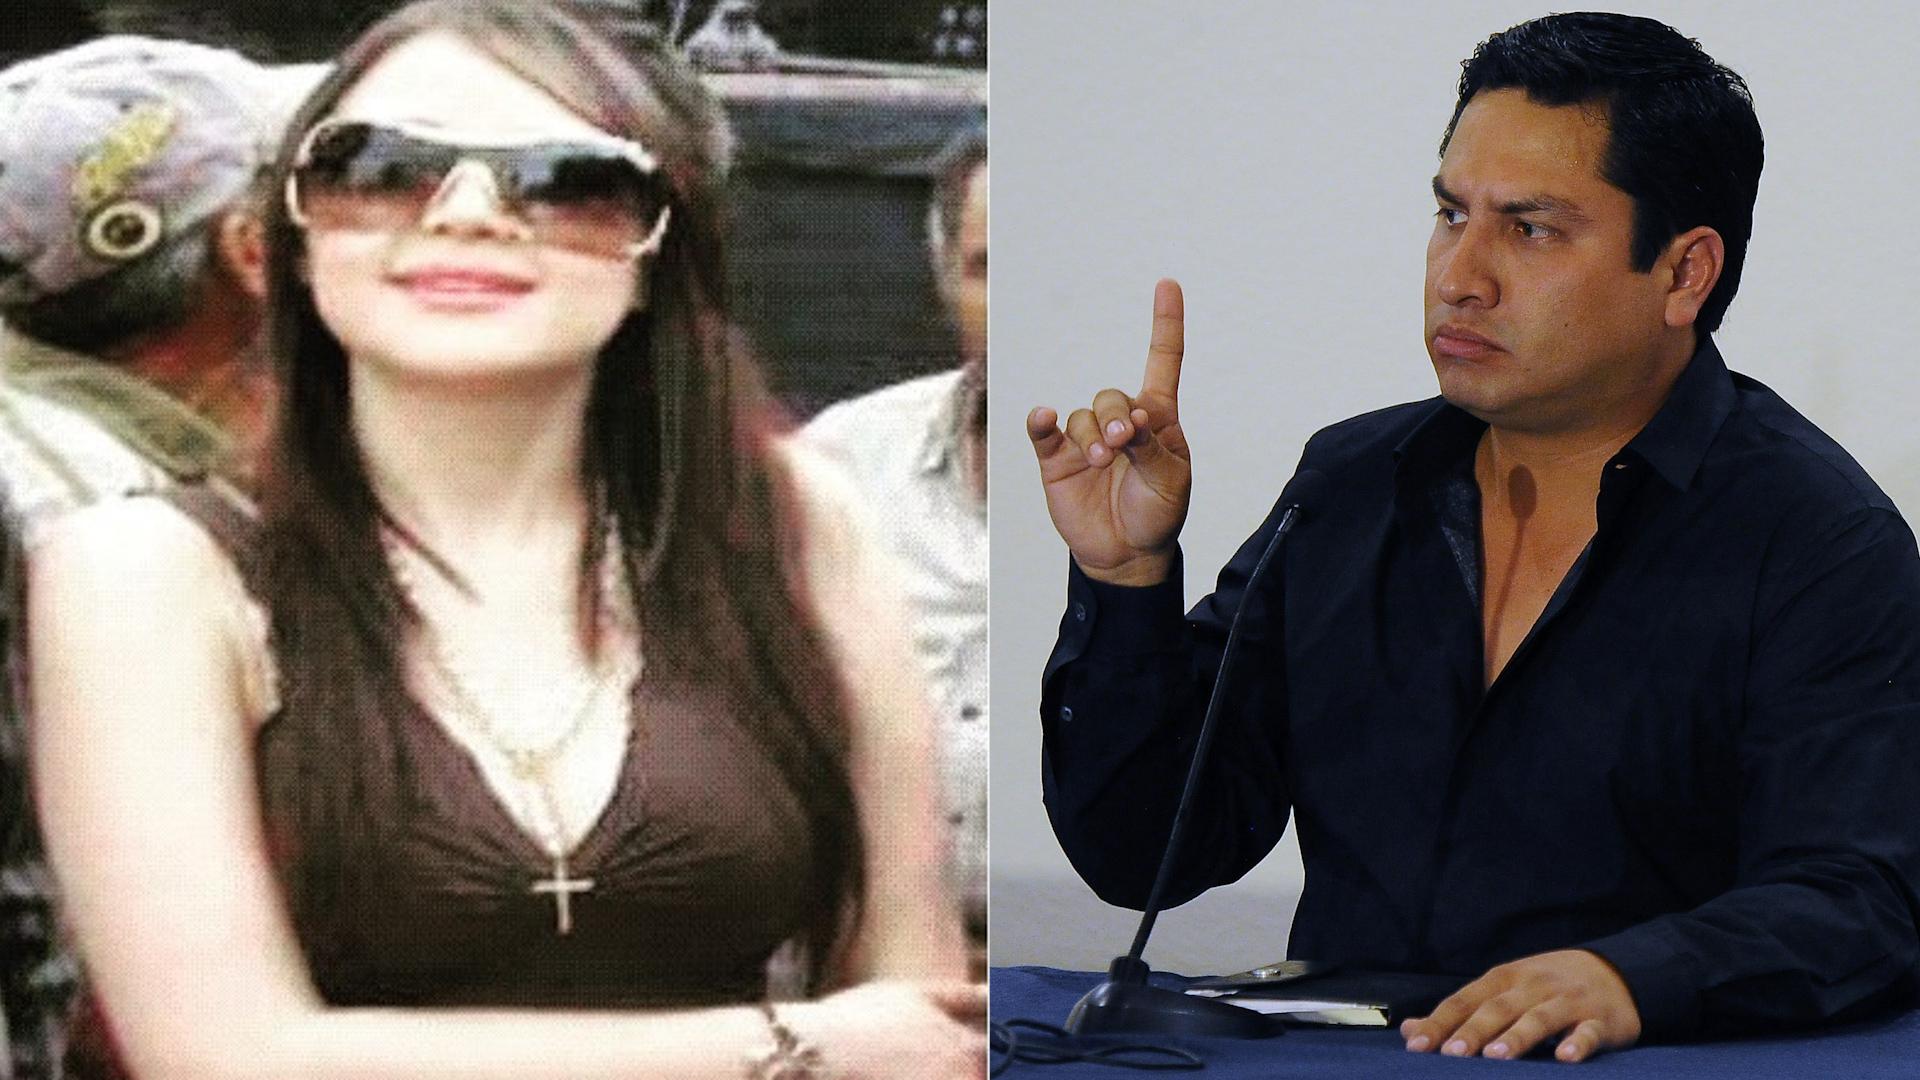 Nataly Fernandez La Mujer Que Vincula A Julion Alvarez Con